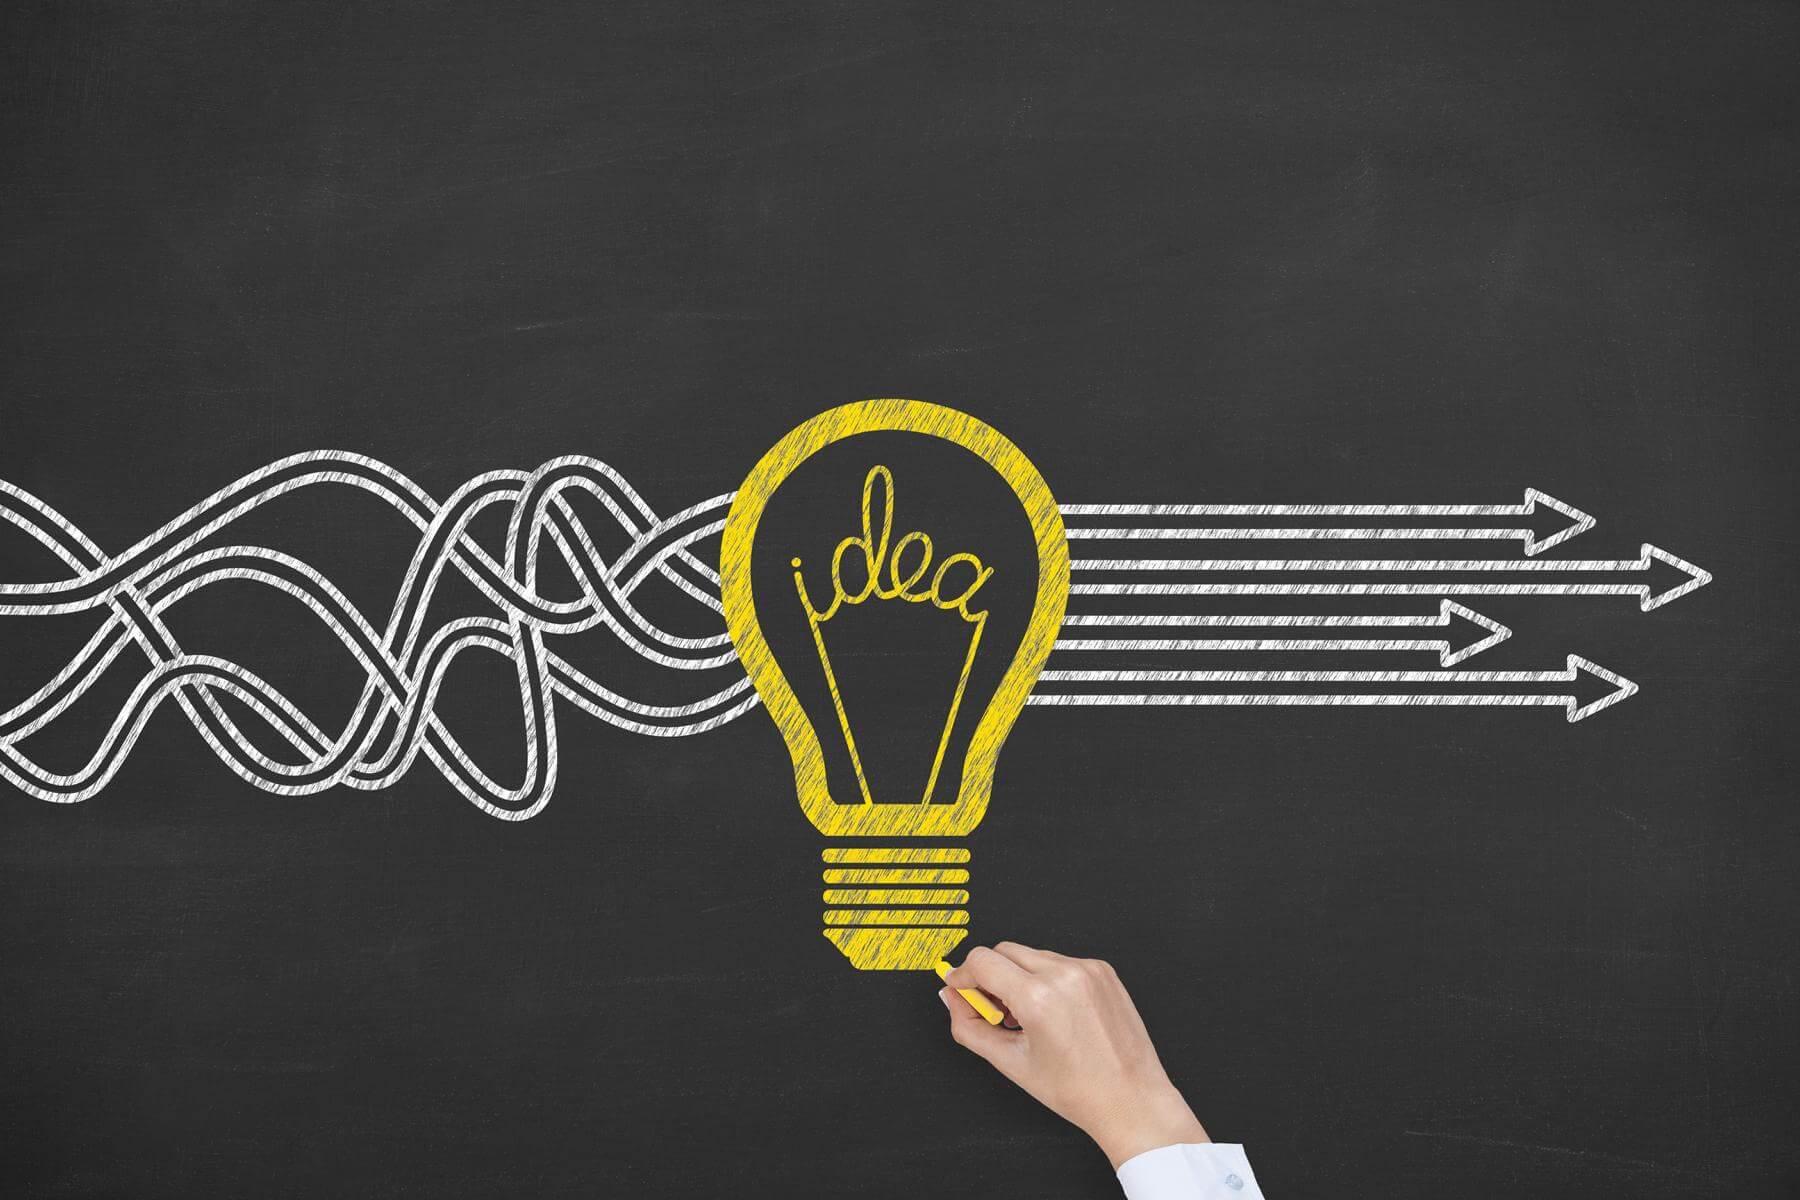 Business-Tools-Weiterbildungskurse-Gründungskompetenz